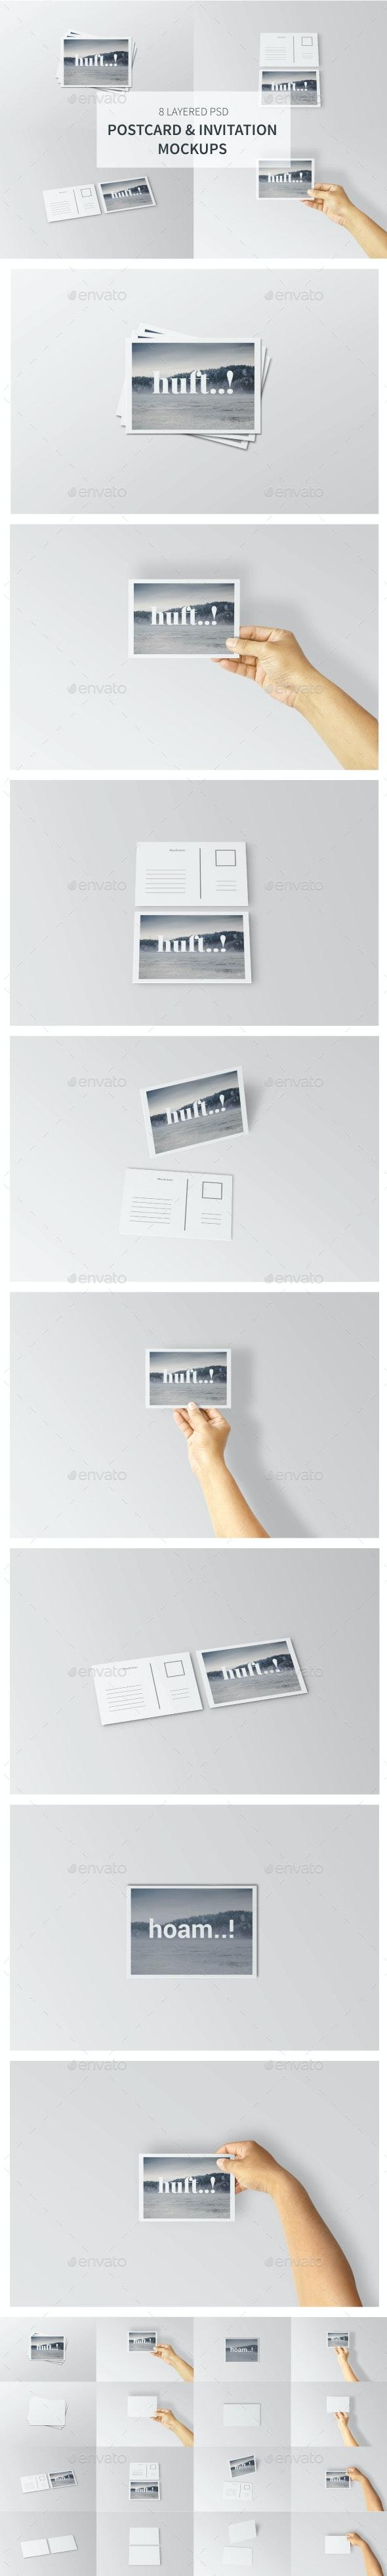 Postcard & Invitation Mockups - Print Product Mock-Ups